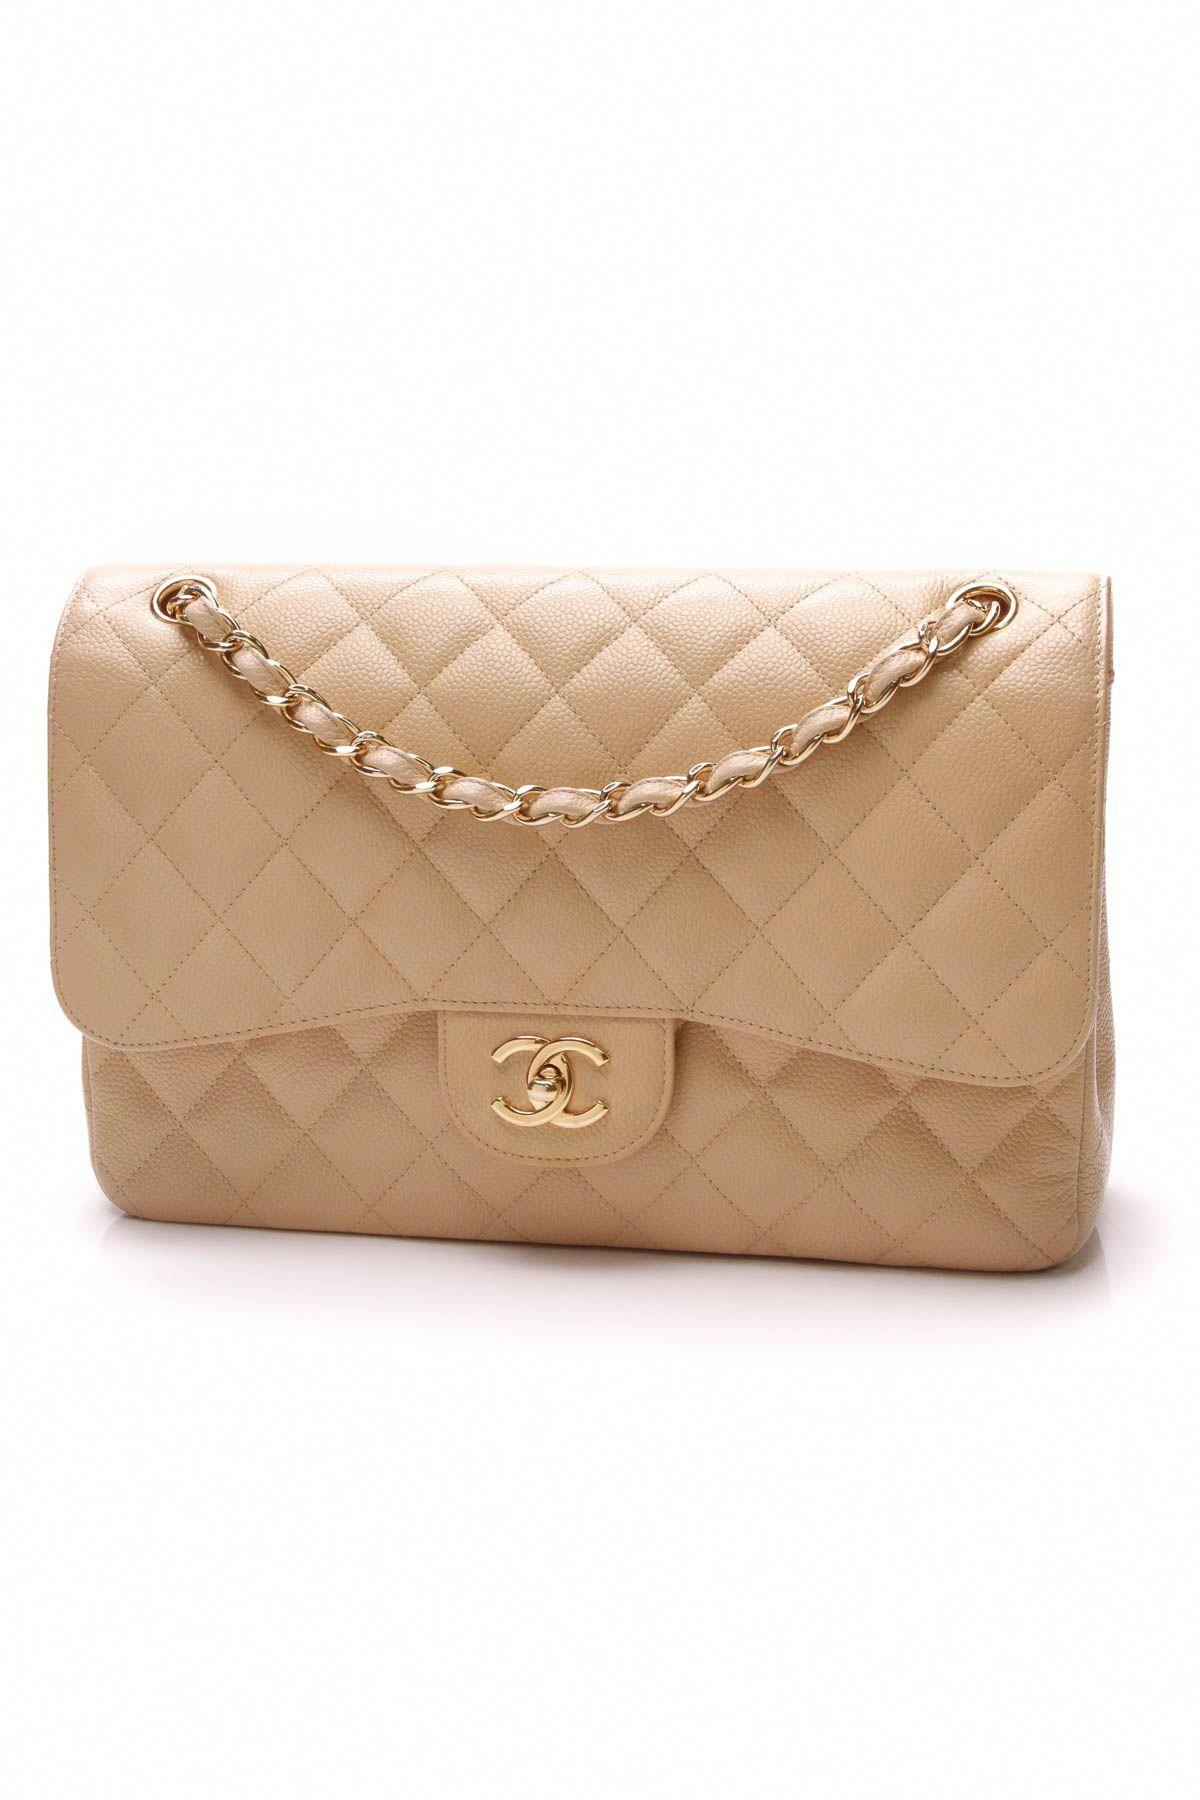 bac4deafc22d Chanel Classic Double Flap Bag - Jumbo Beige Caviar #Chanelhandbags ...